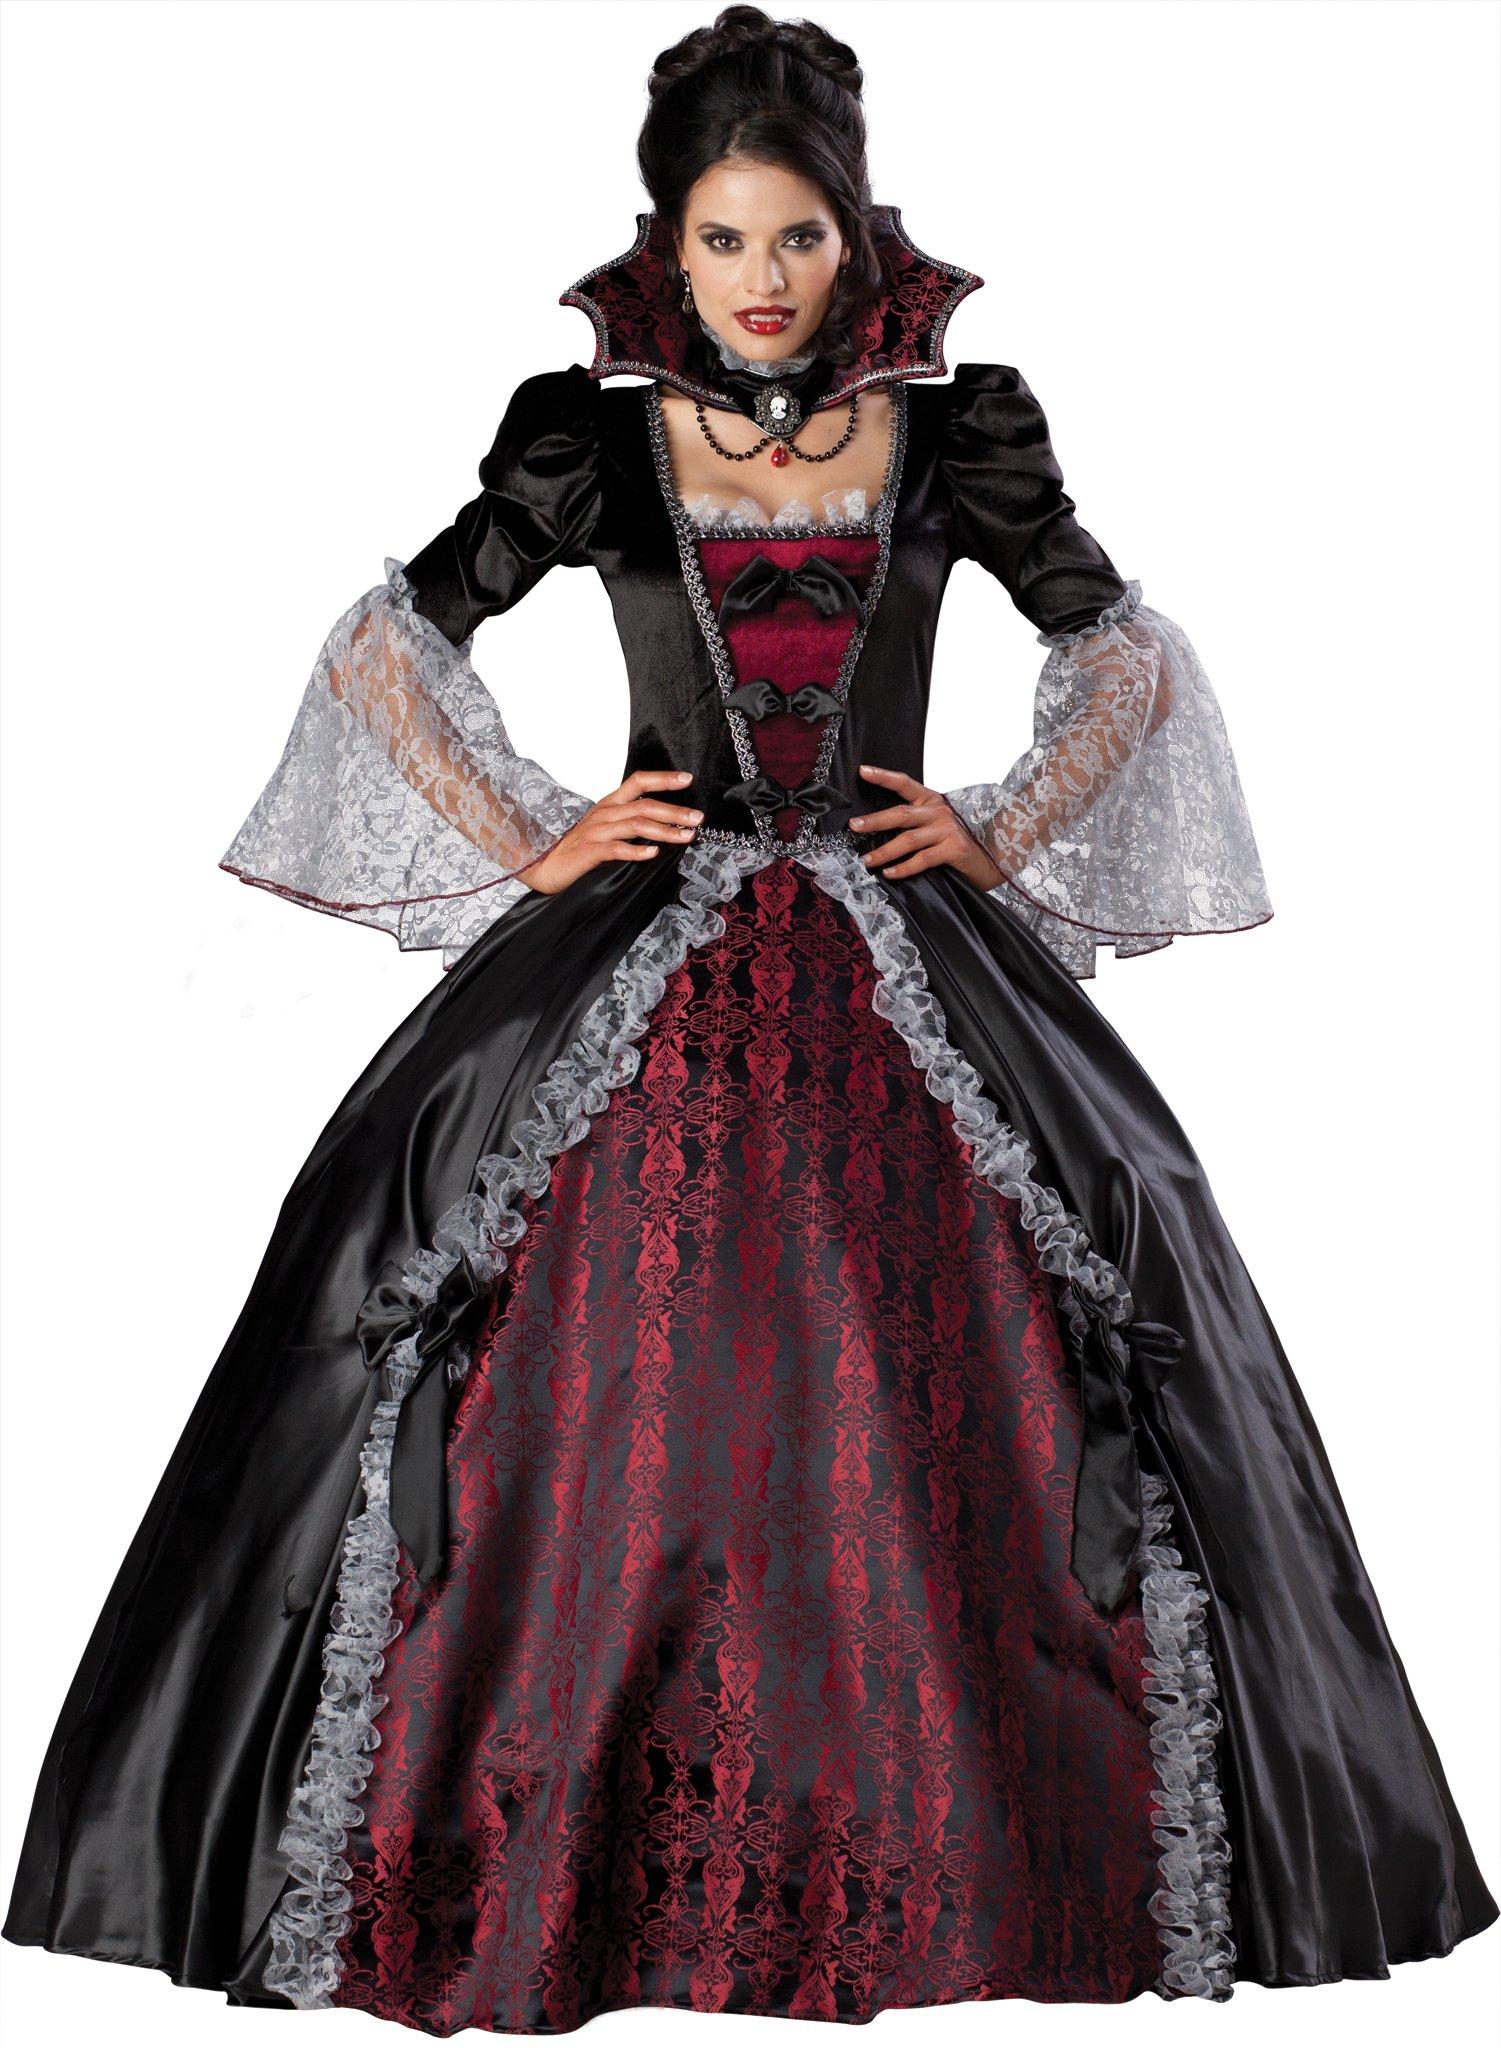 7 Creepiest Halloween Costume Ideas For Girls!